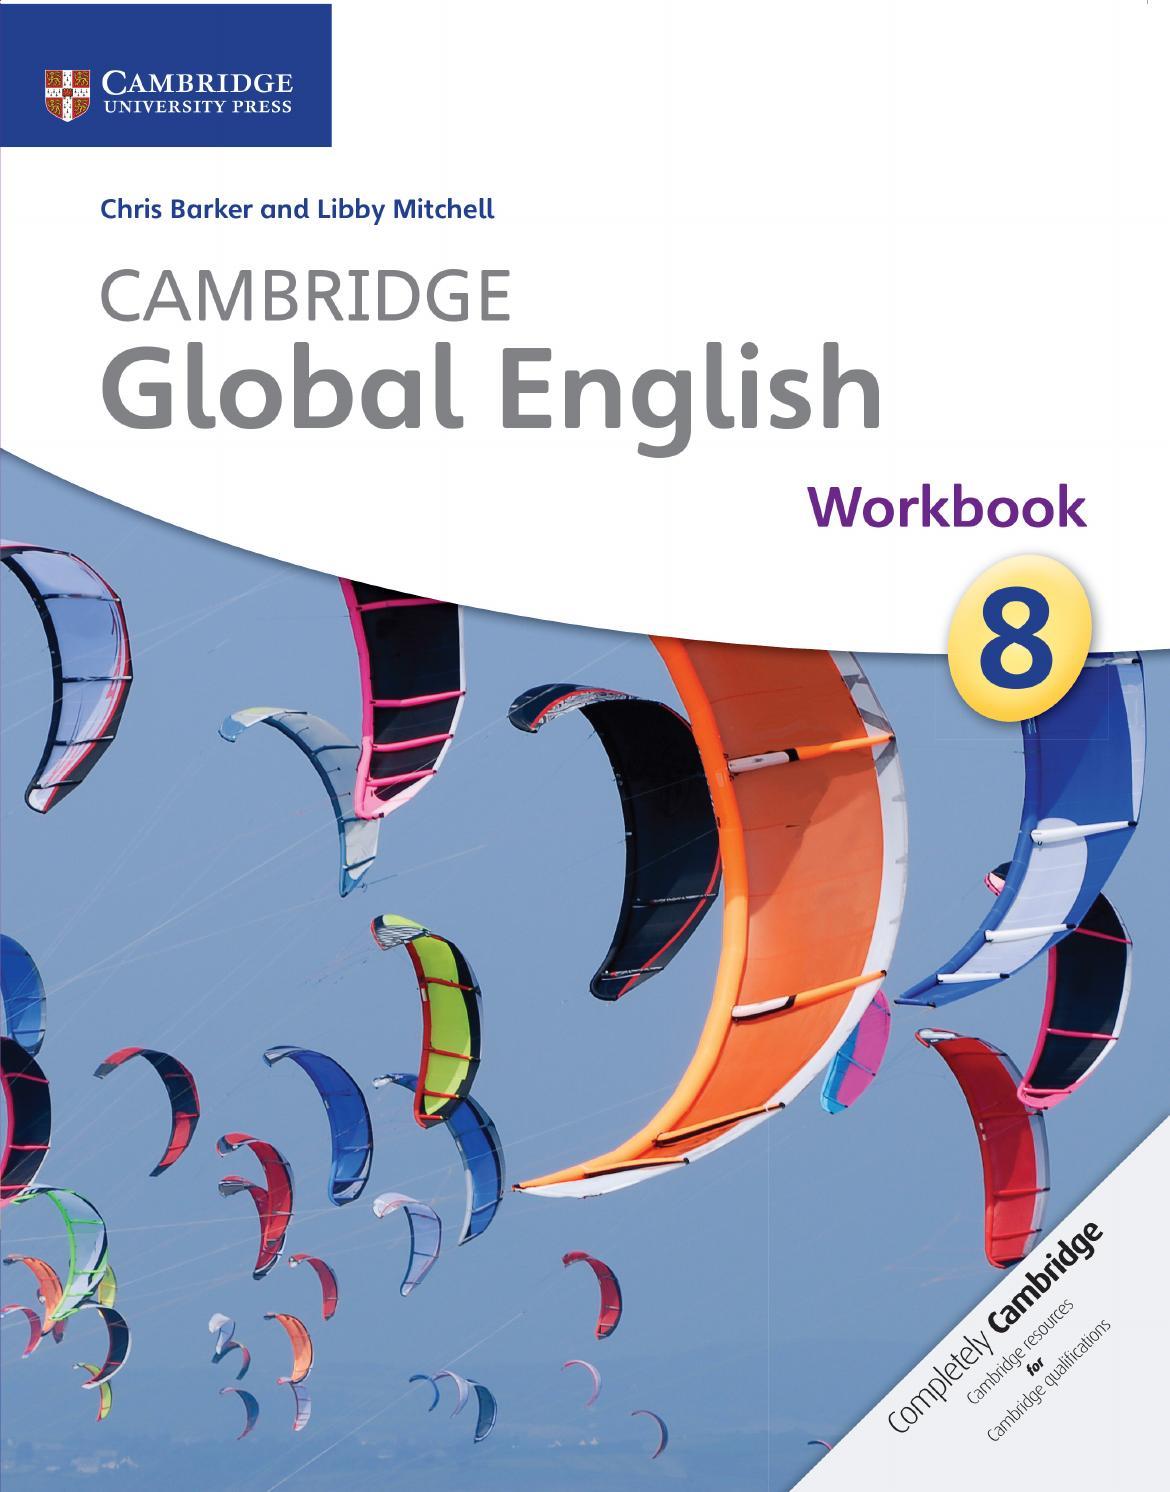 Preview Cambridge Global English Workbook 8 by Cambridge University Press  Education - issuu